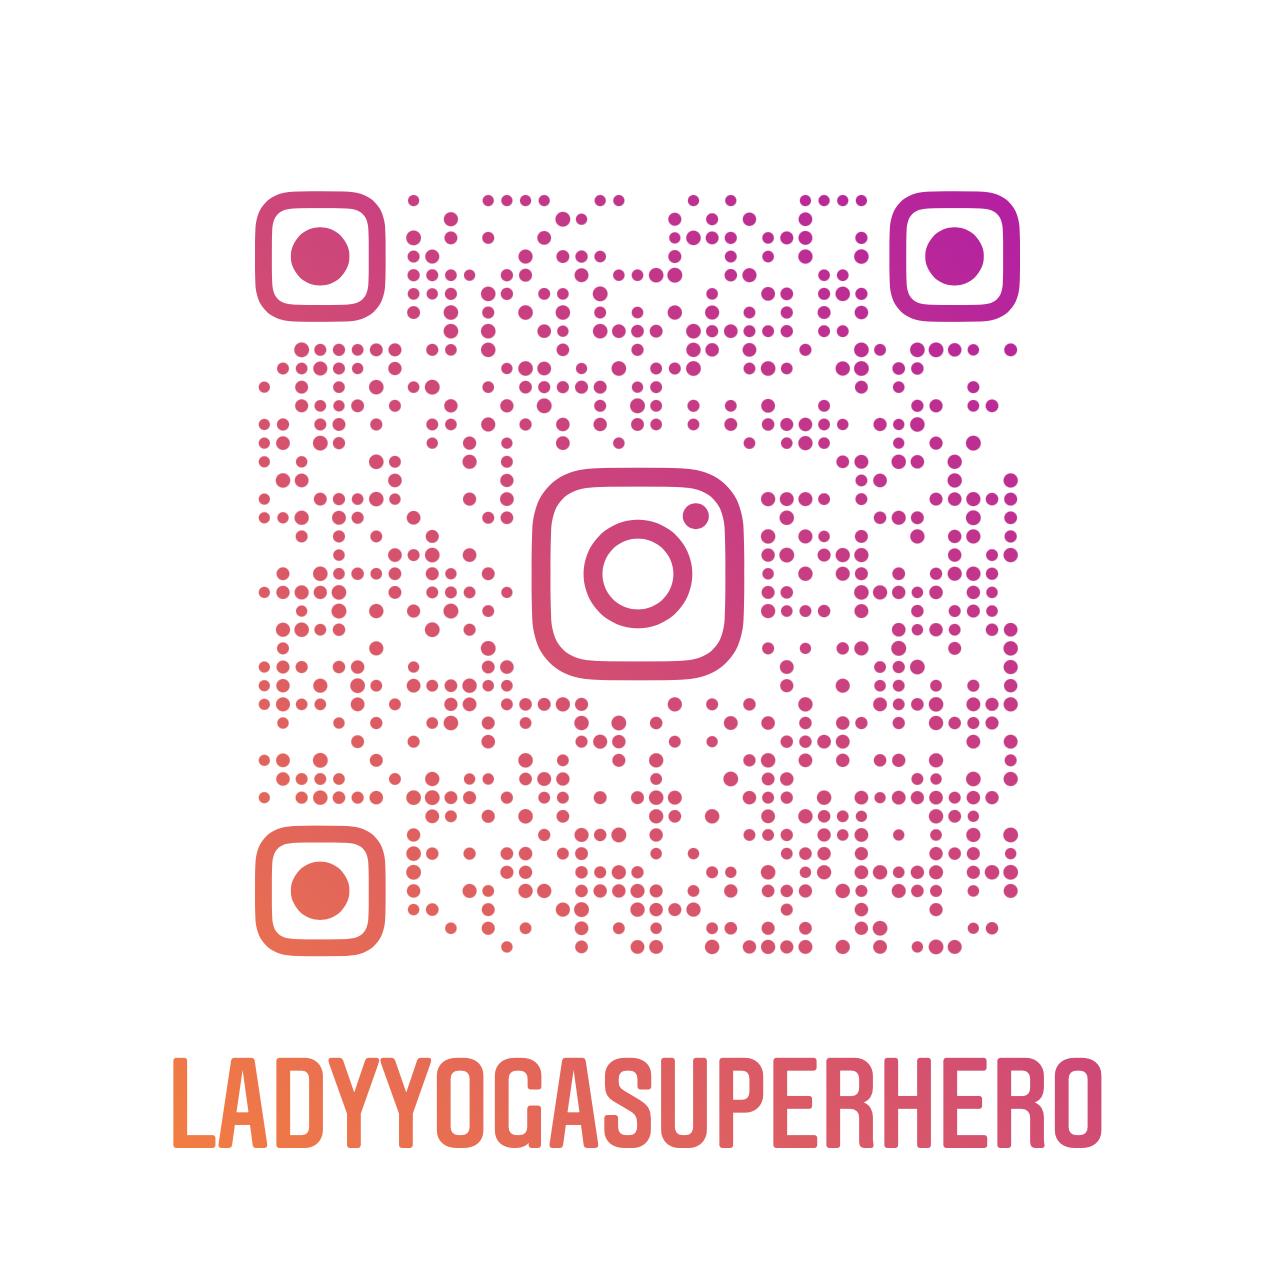 http://ladyyogasuperhero.com/wp-content/uploads/2020/12/ladyyogasuperhero_nametag-4.png